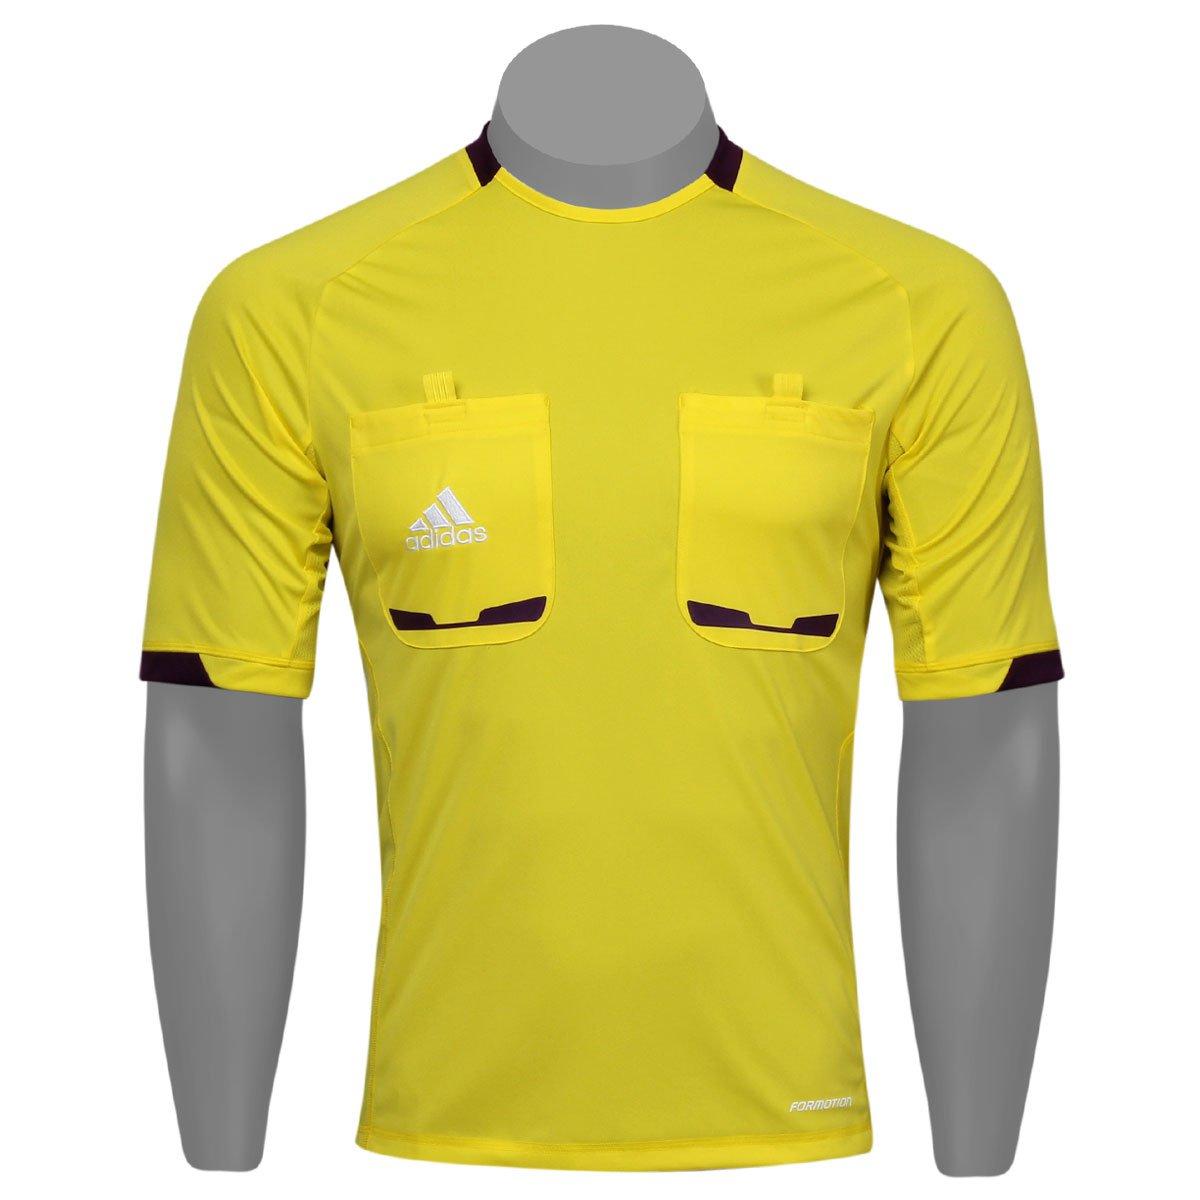 4c59b04ad945c Camisa Adidas Árbitro - Compre Agora